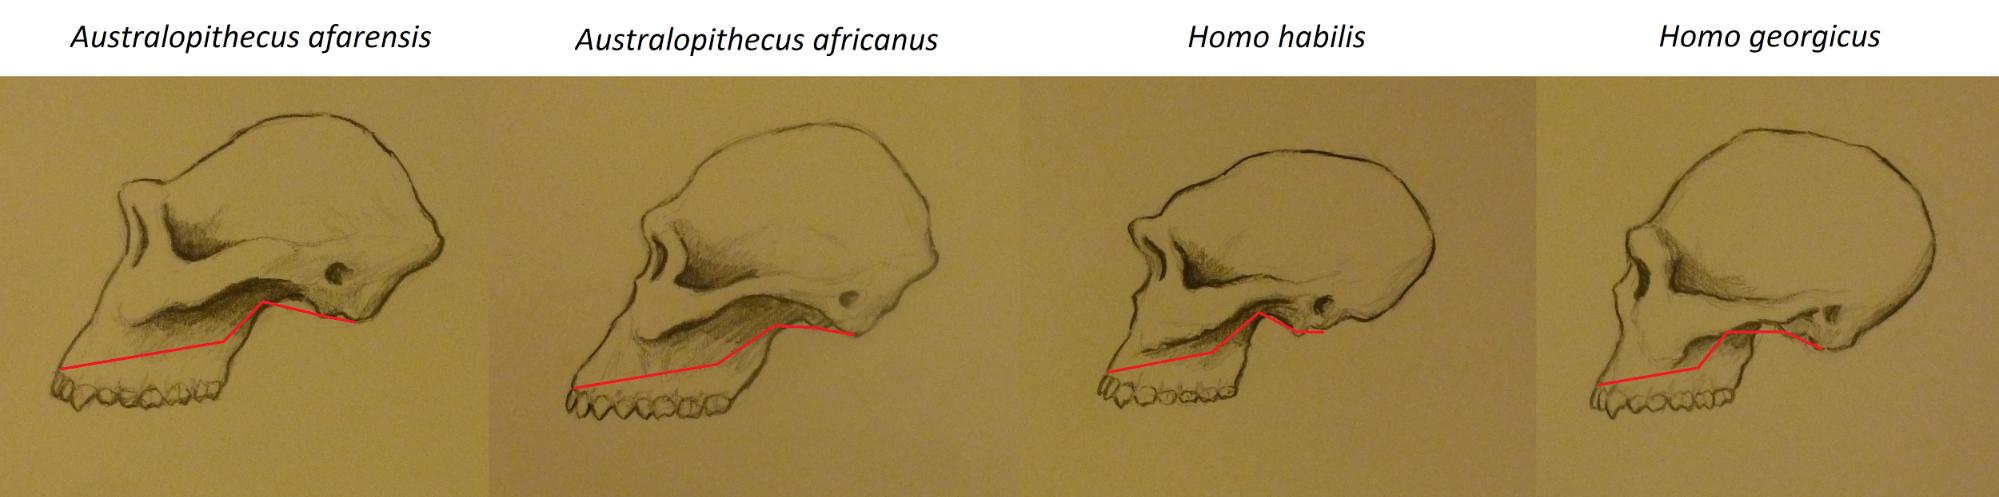 Figure 7.30 Basicranial flexion in four hominin species. Illustration by Keenan Taylor.